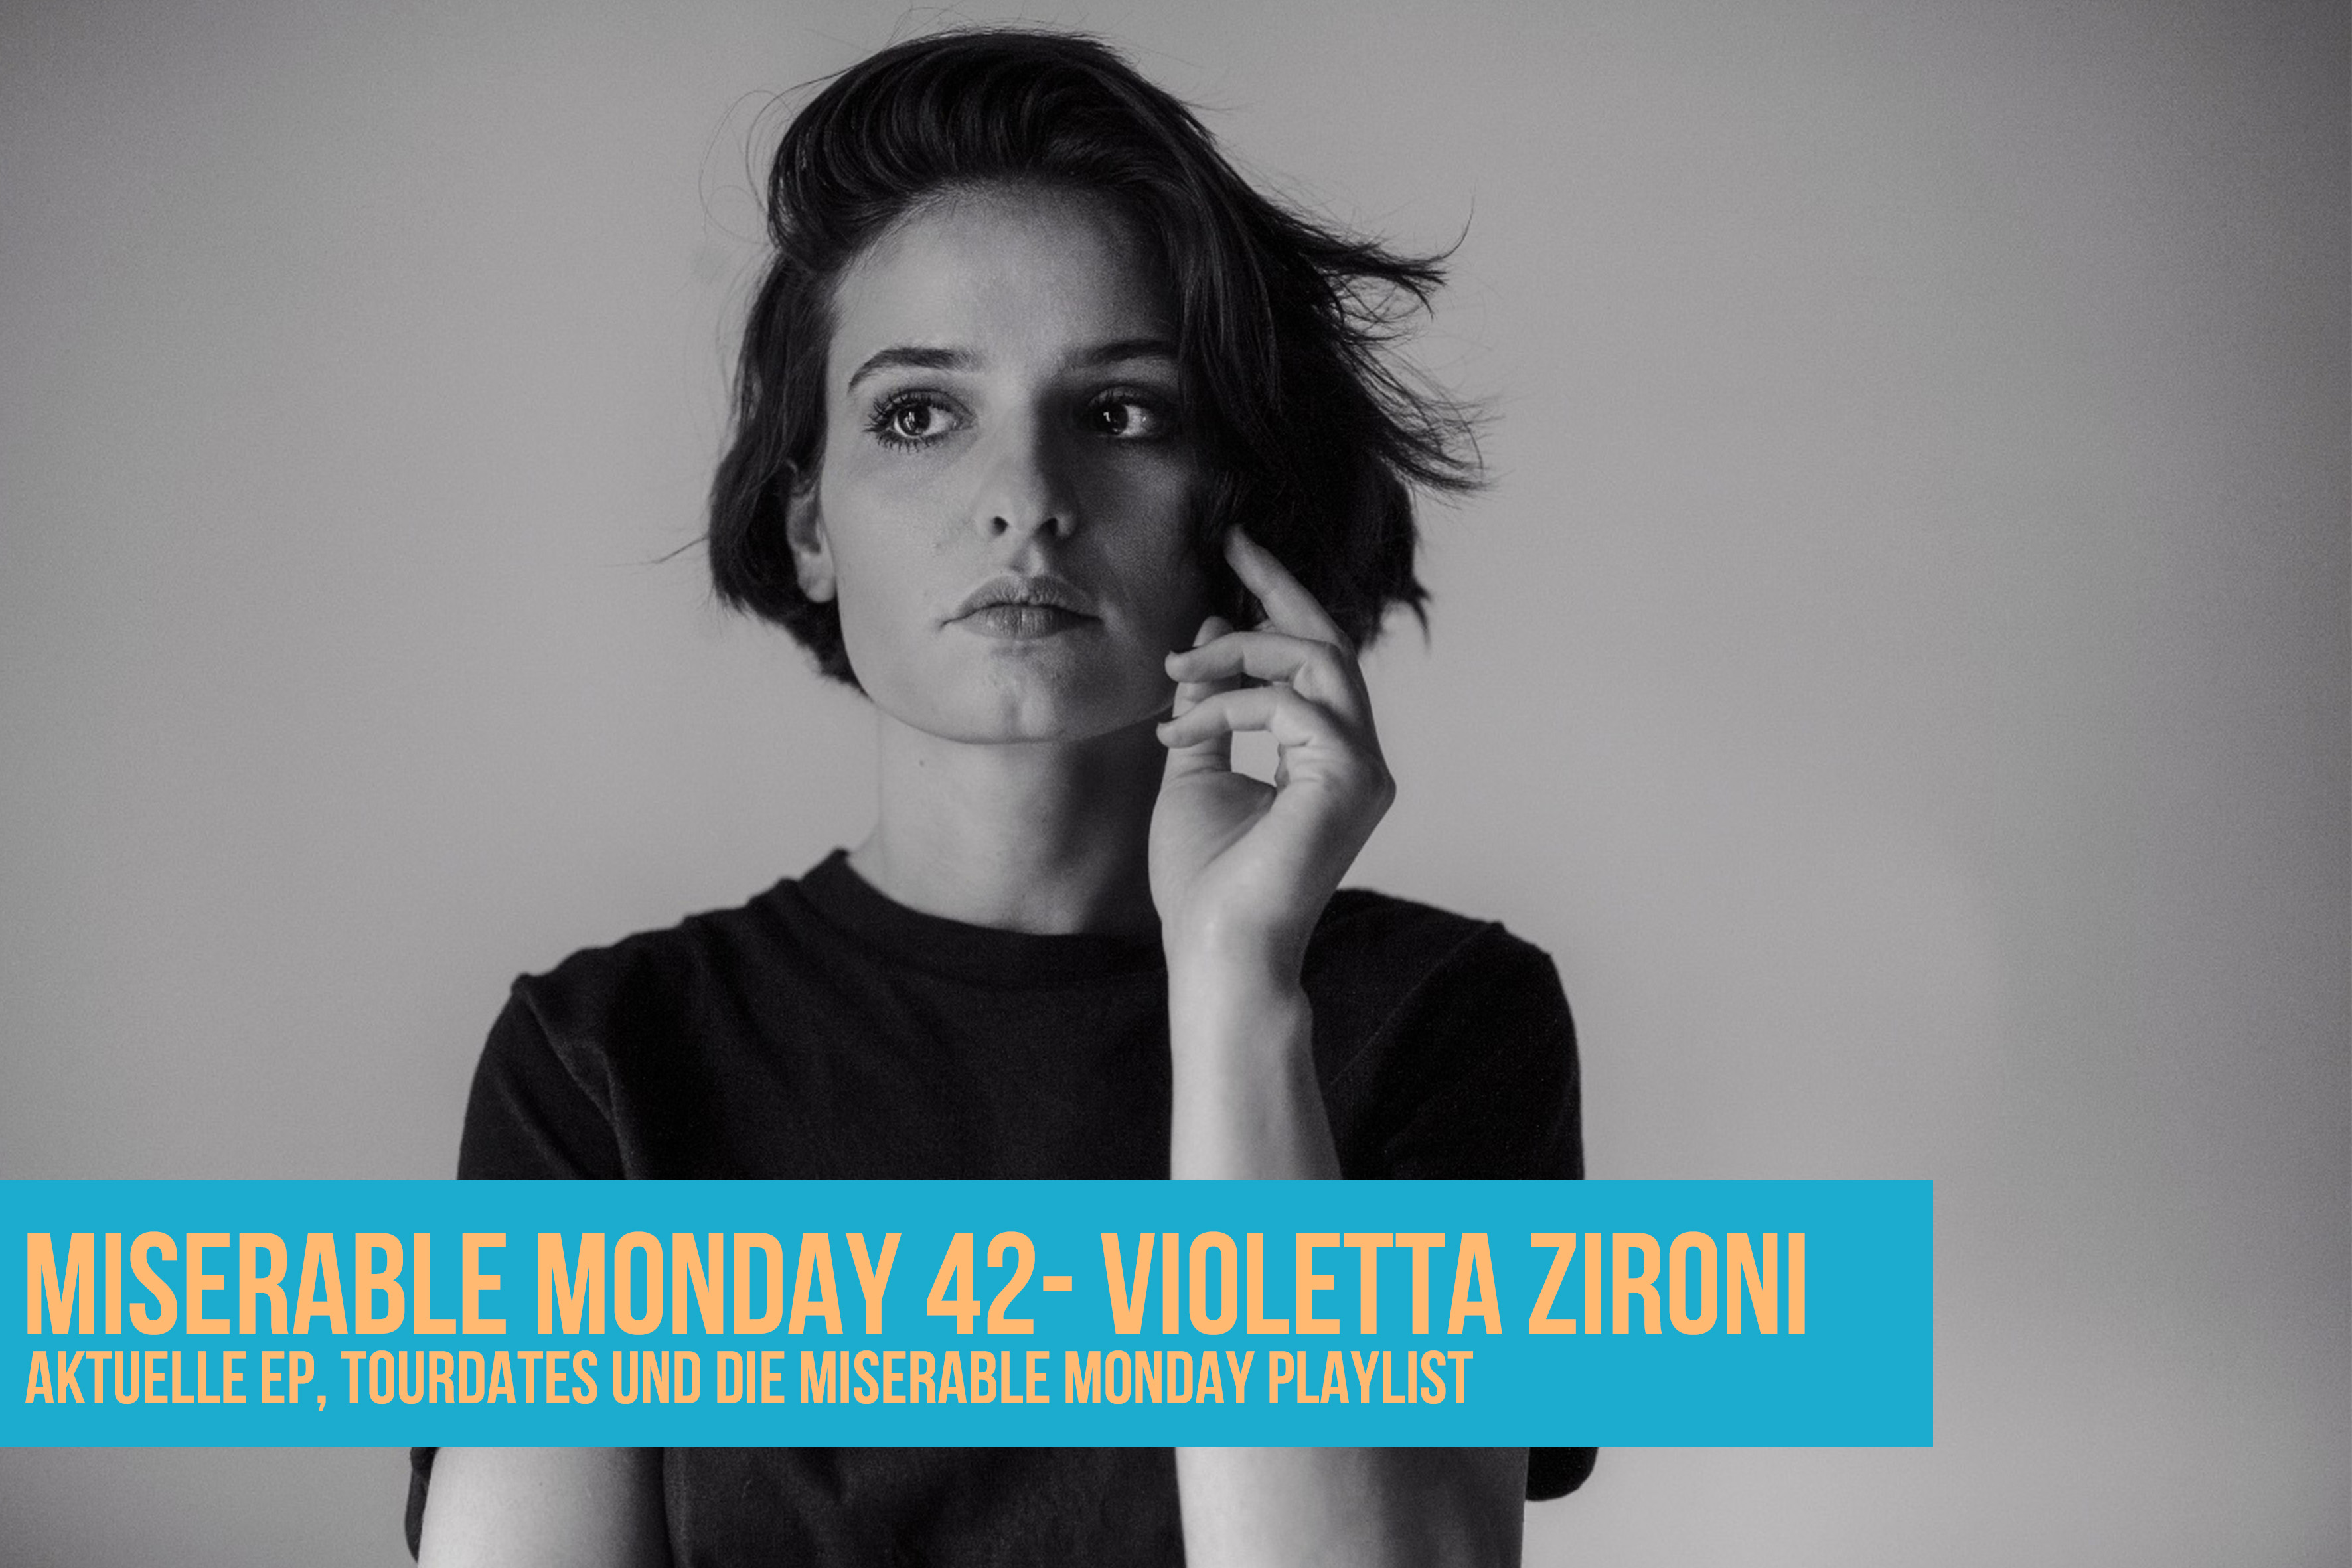 042 - Violetta Zironi